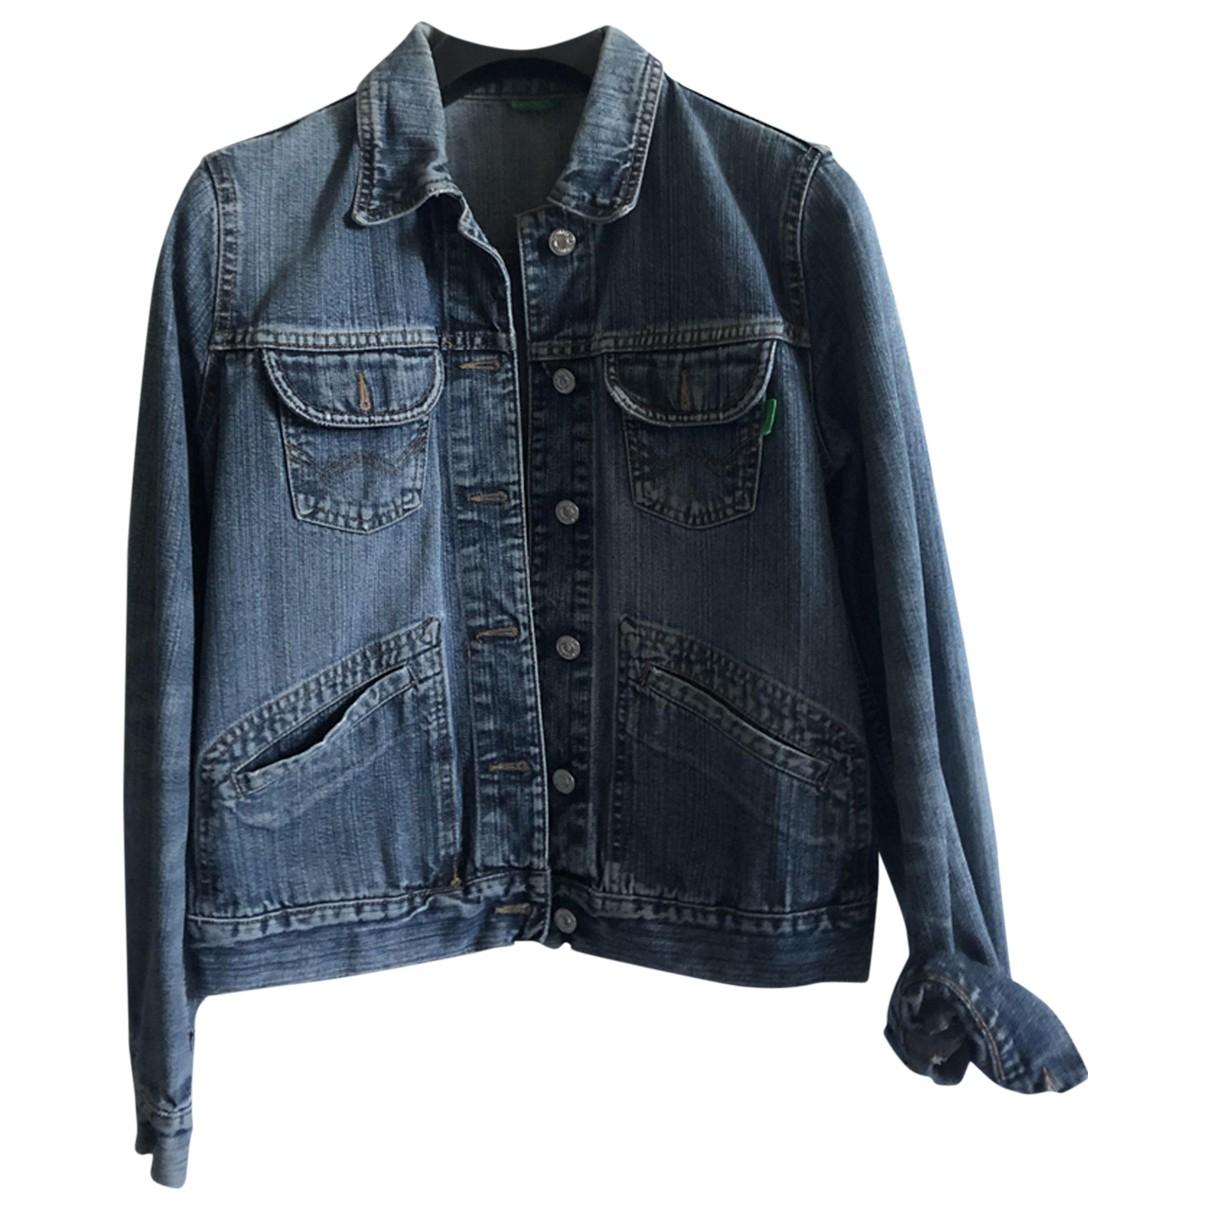 Benetton \N Blue Denim - Jeans jacket for Women S International